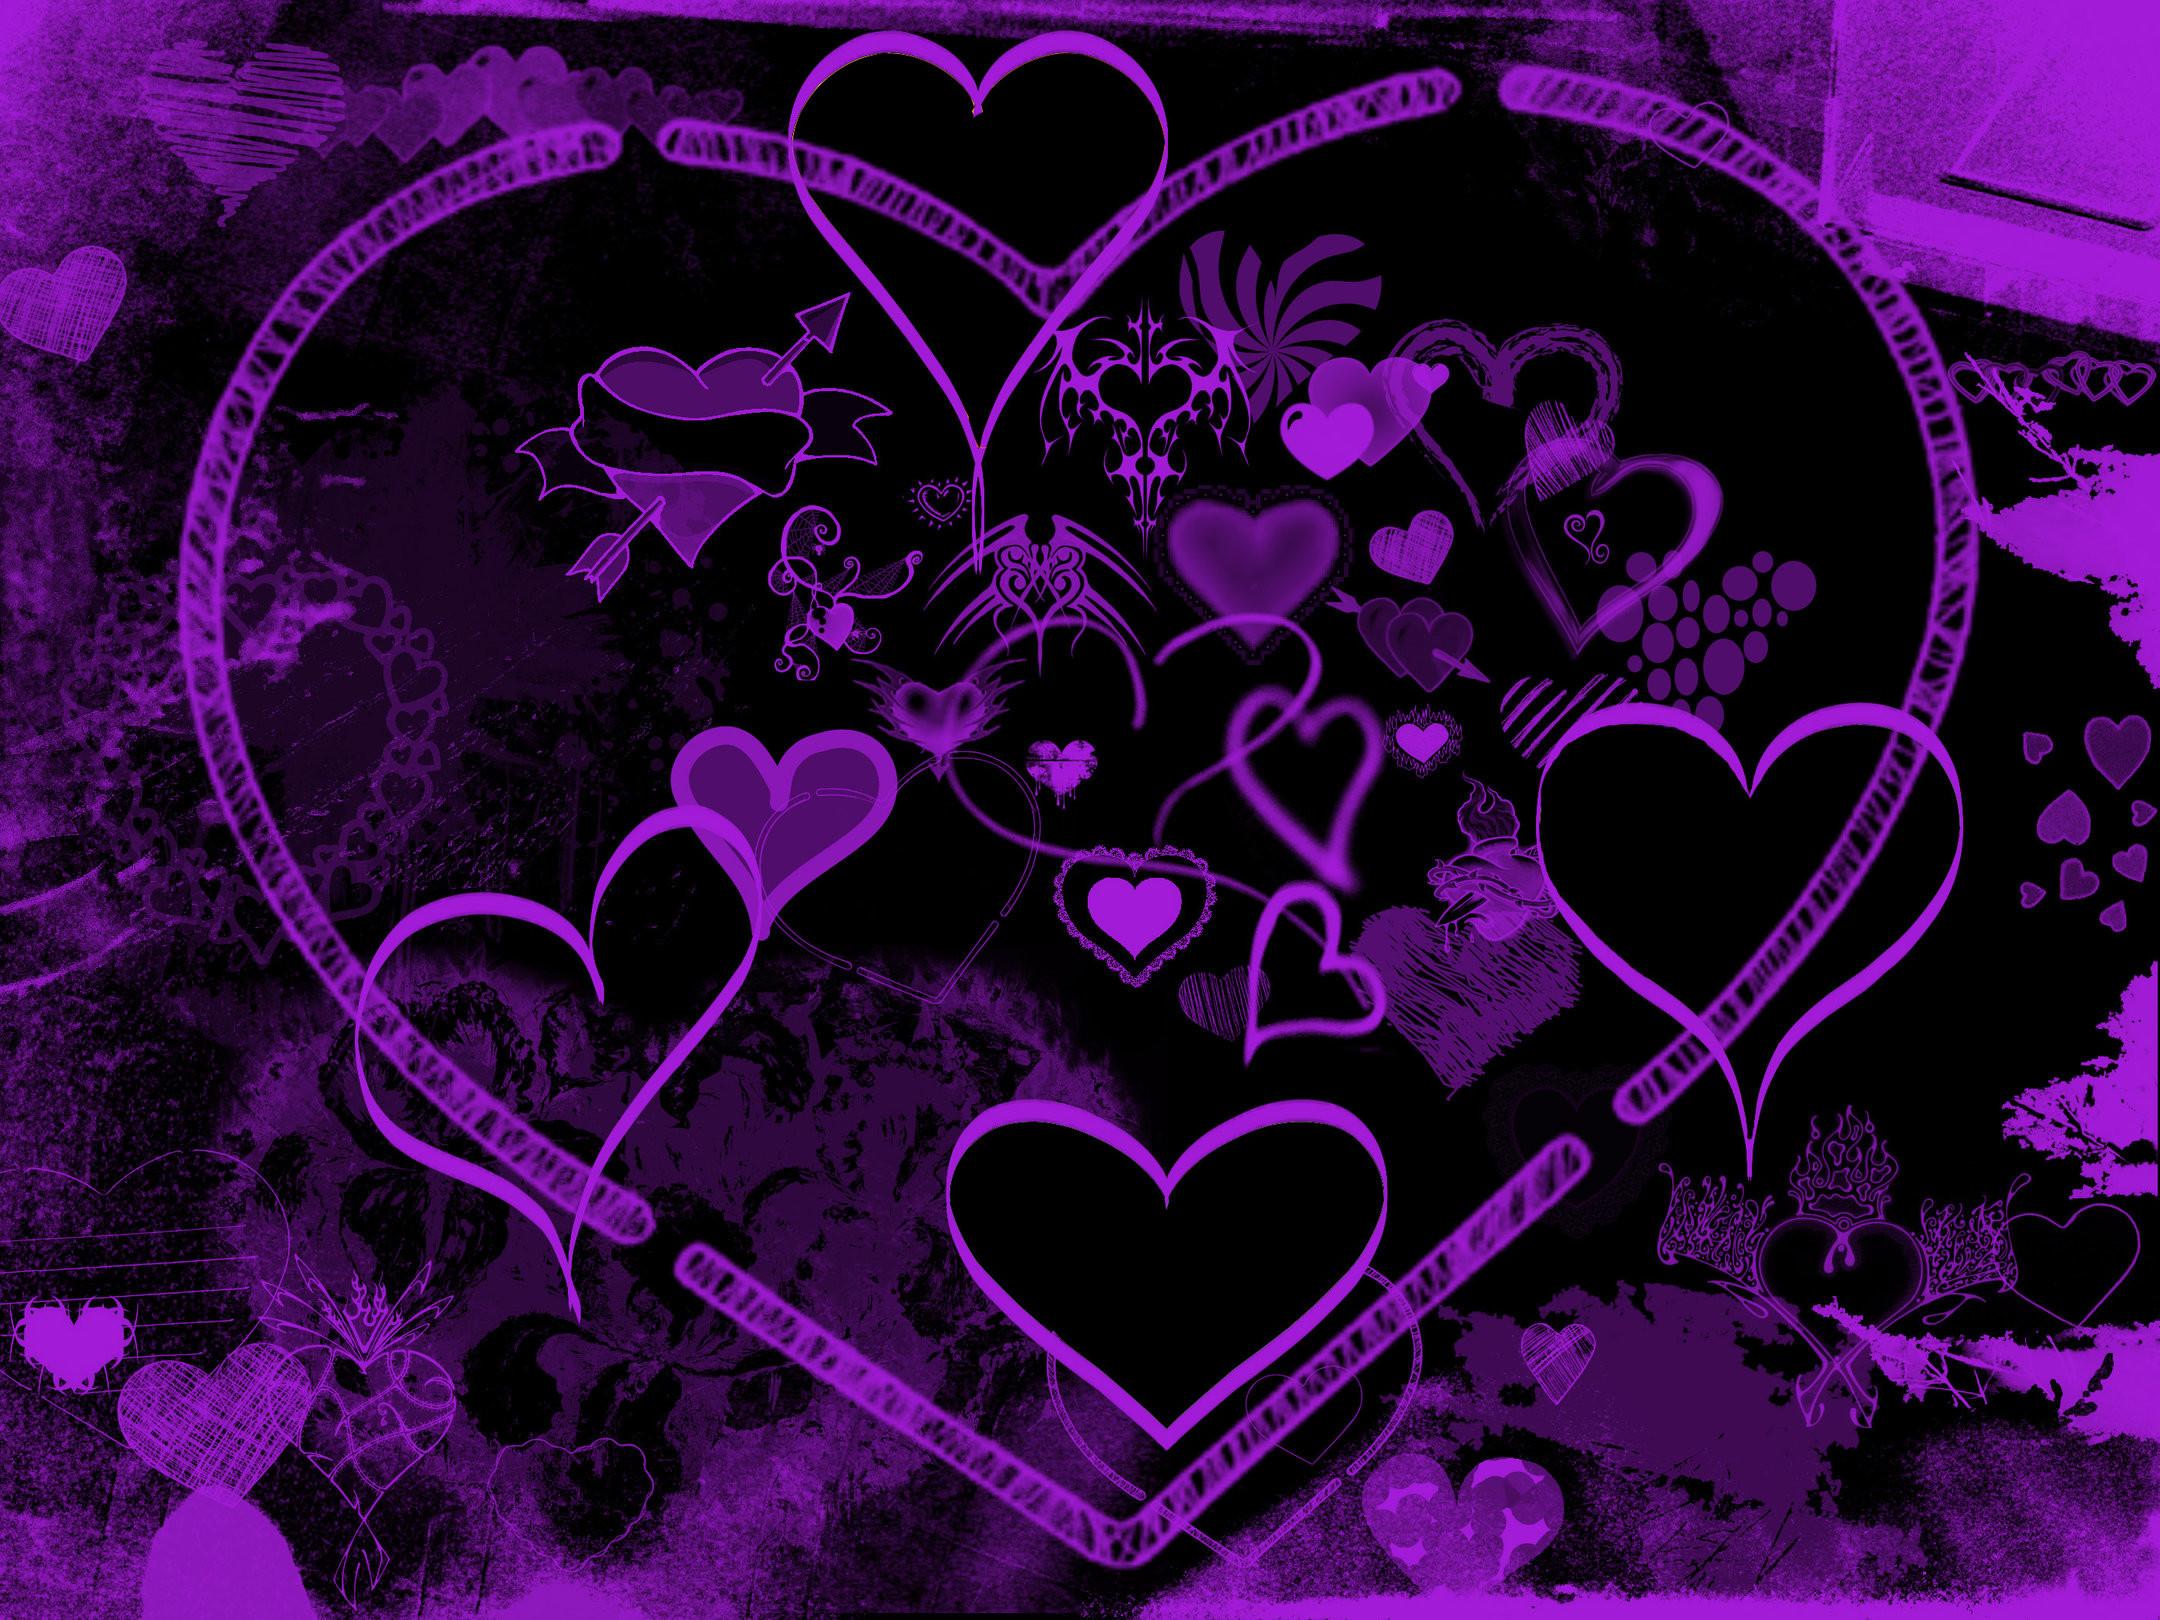 Purple Hearts by Daemonika on DeviantArt